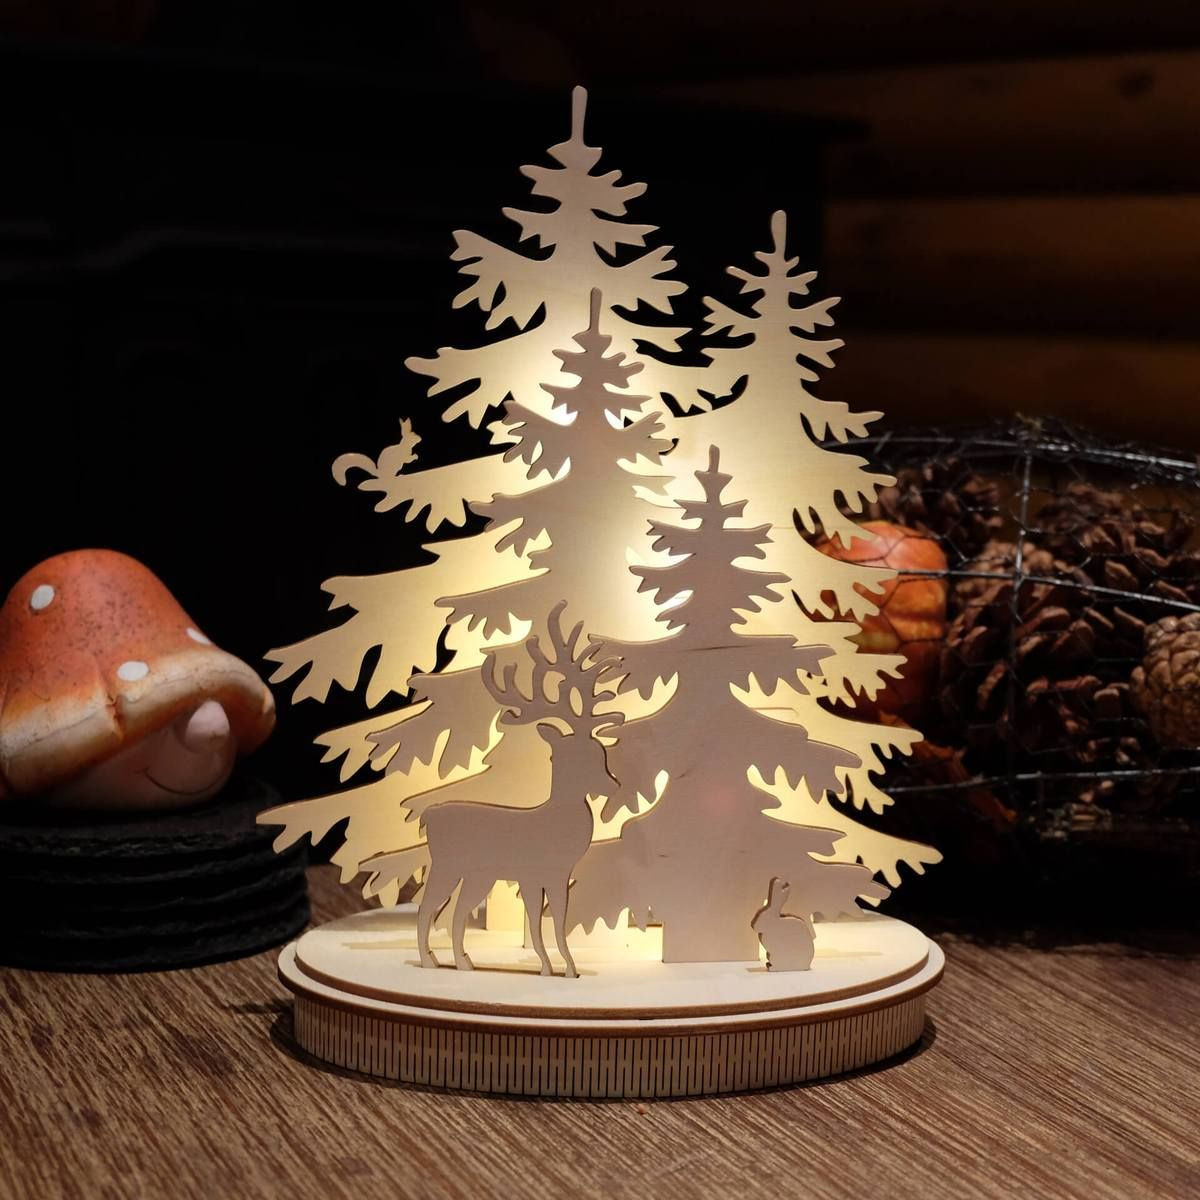 Woodland Winter Christmas Decoration Christmas Decorations Christmas Lights Christmas Paper Crafts